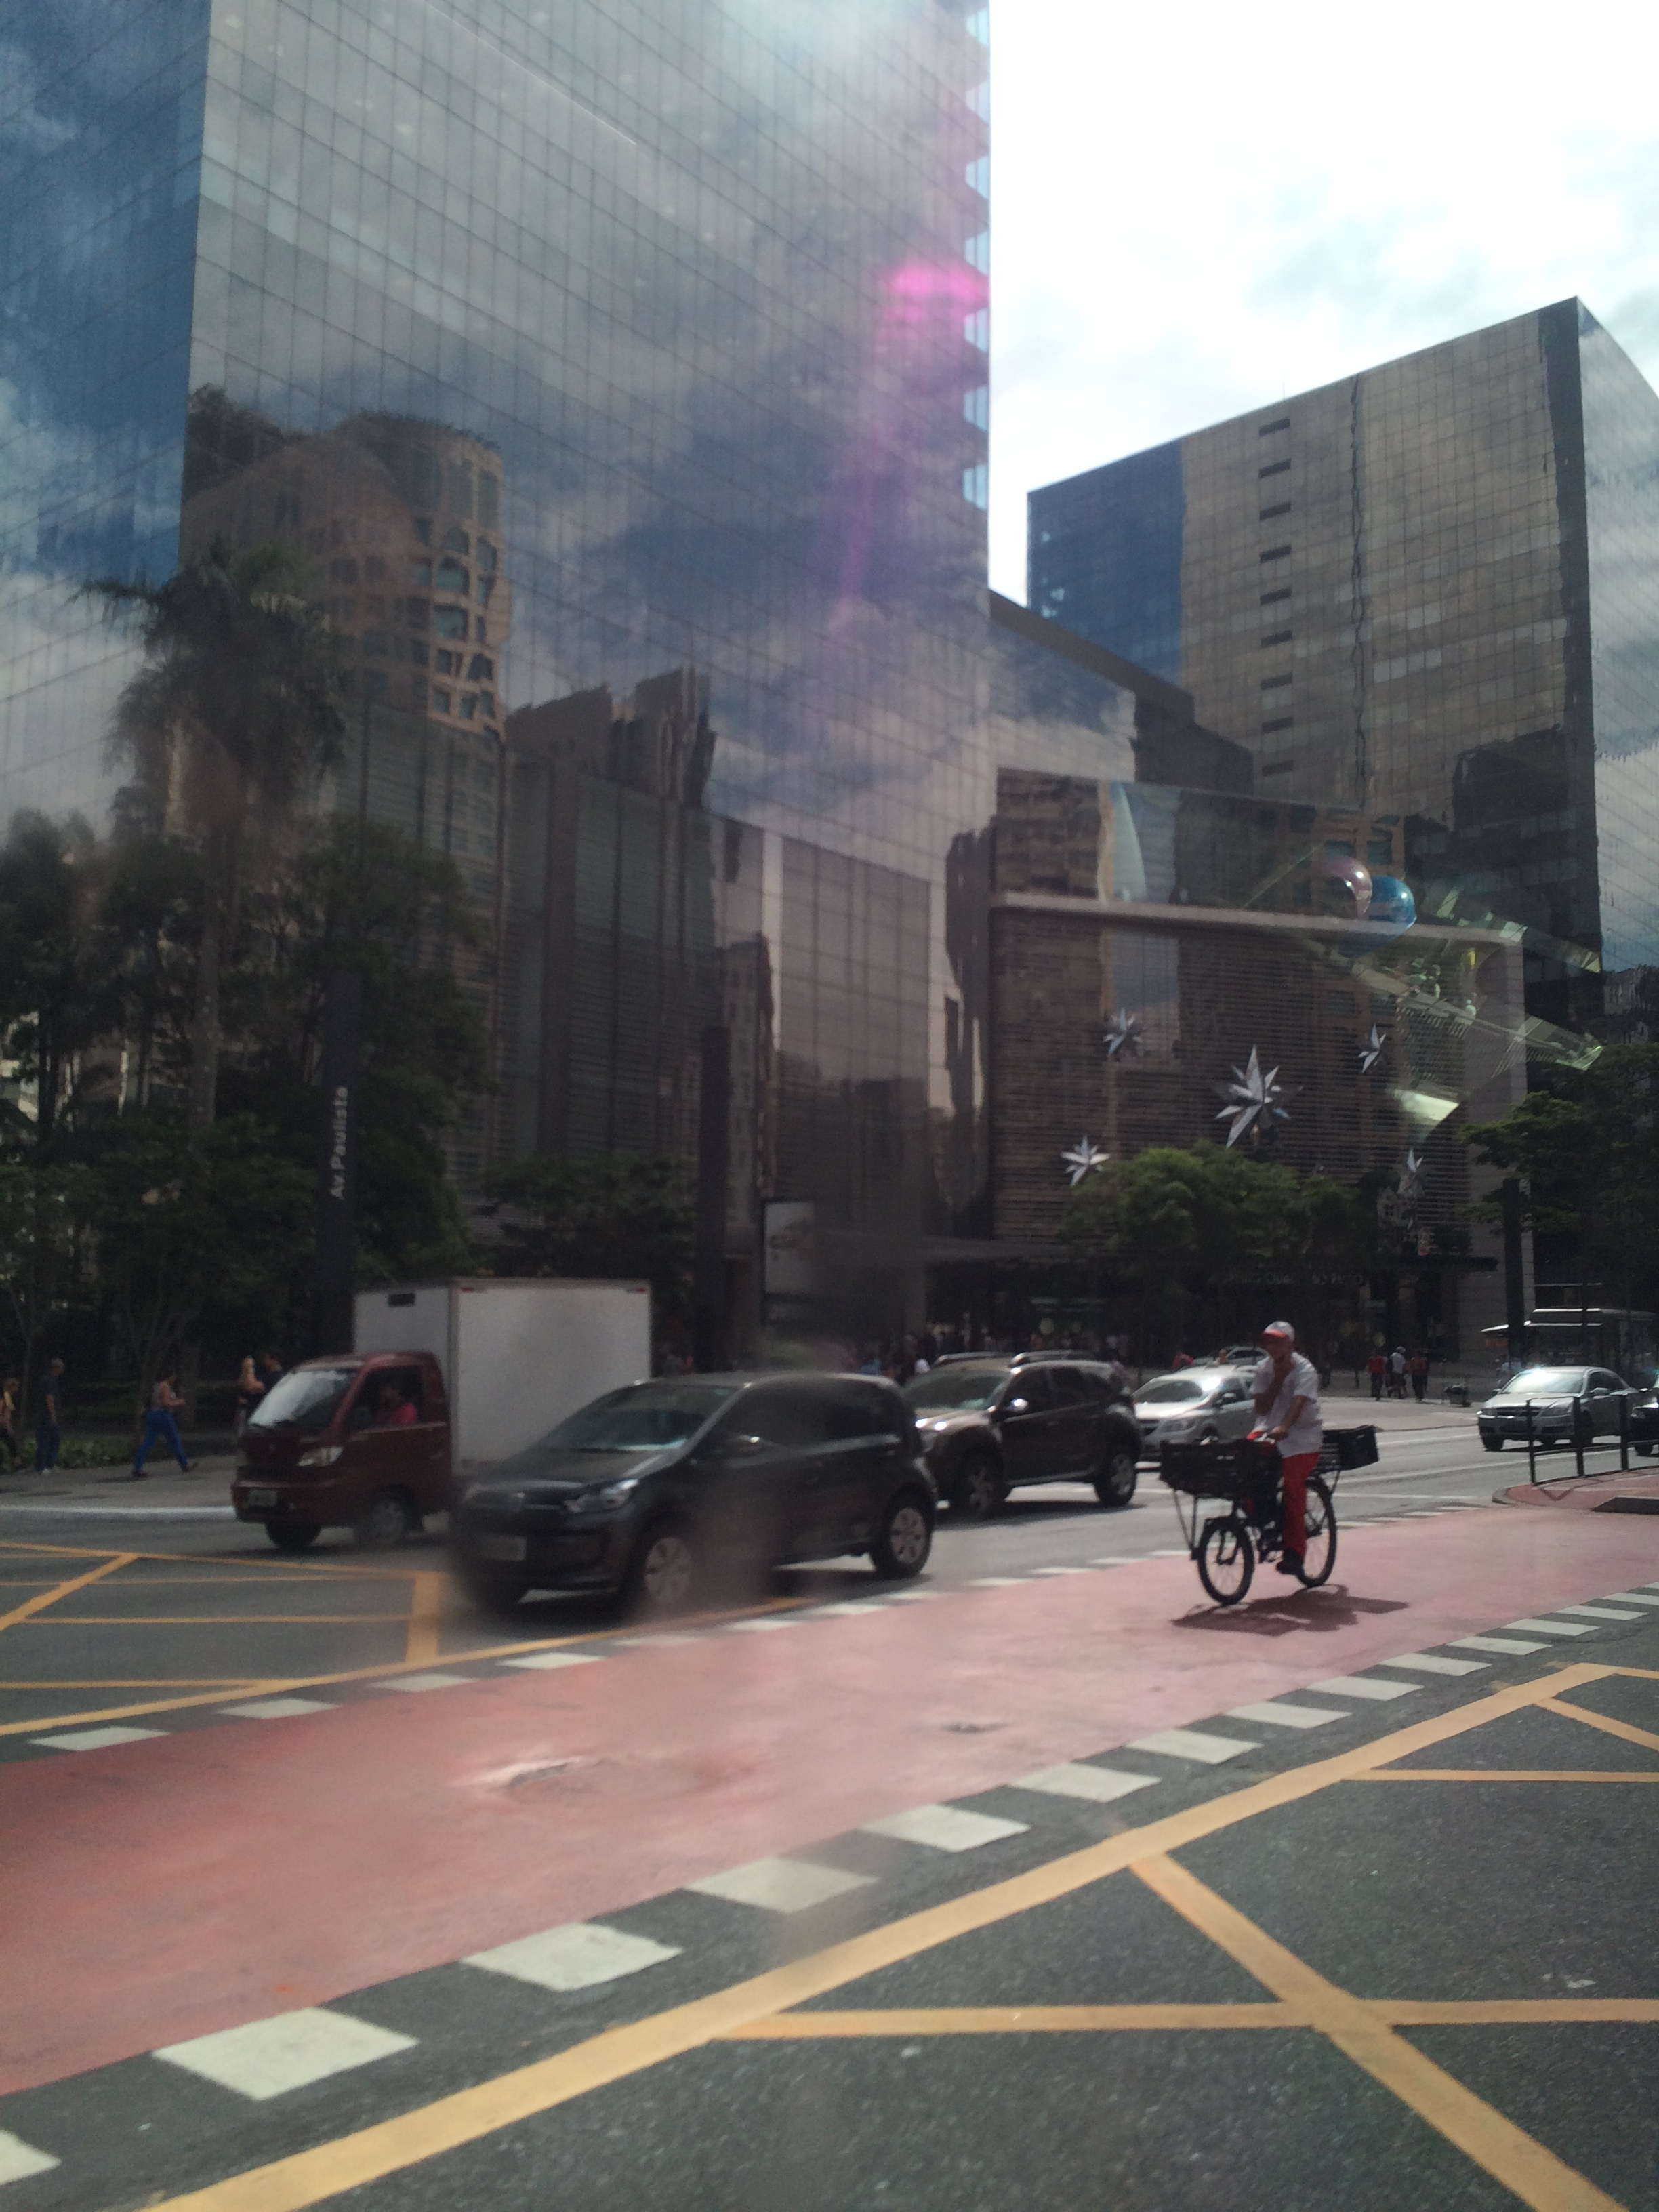 Street view of city